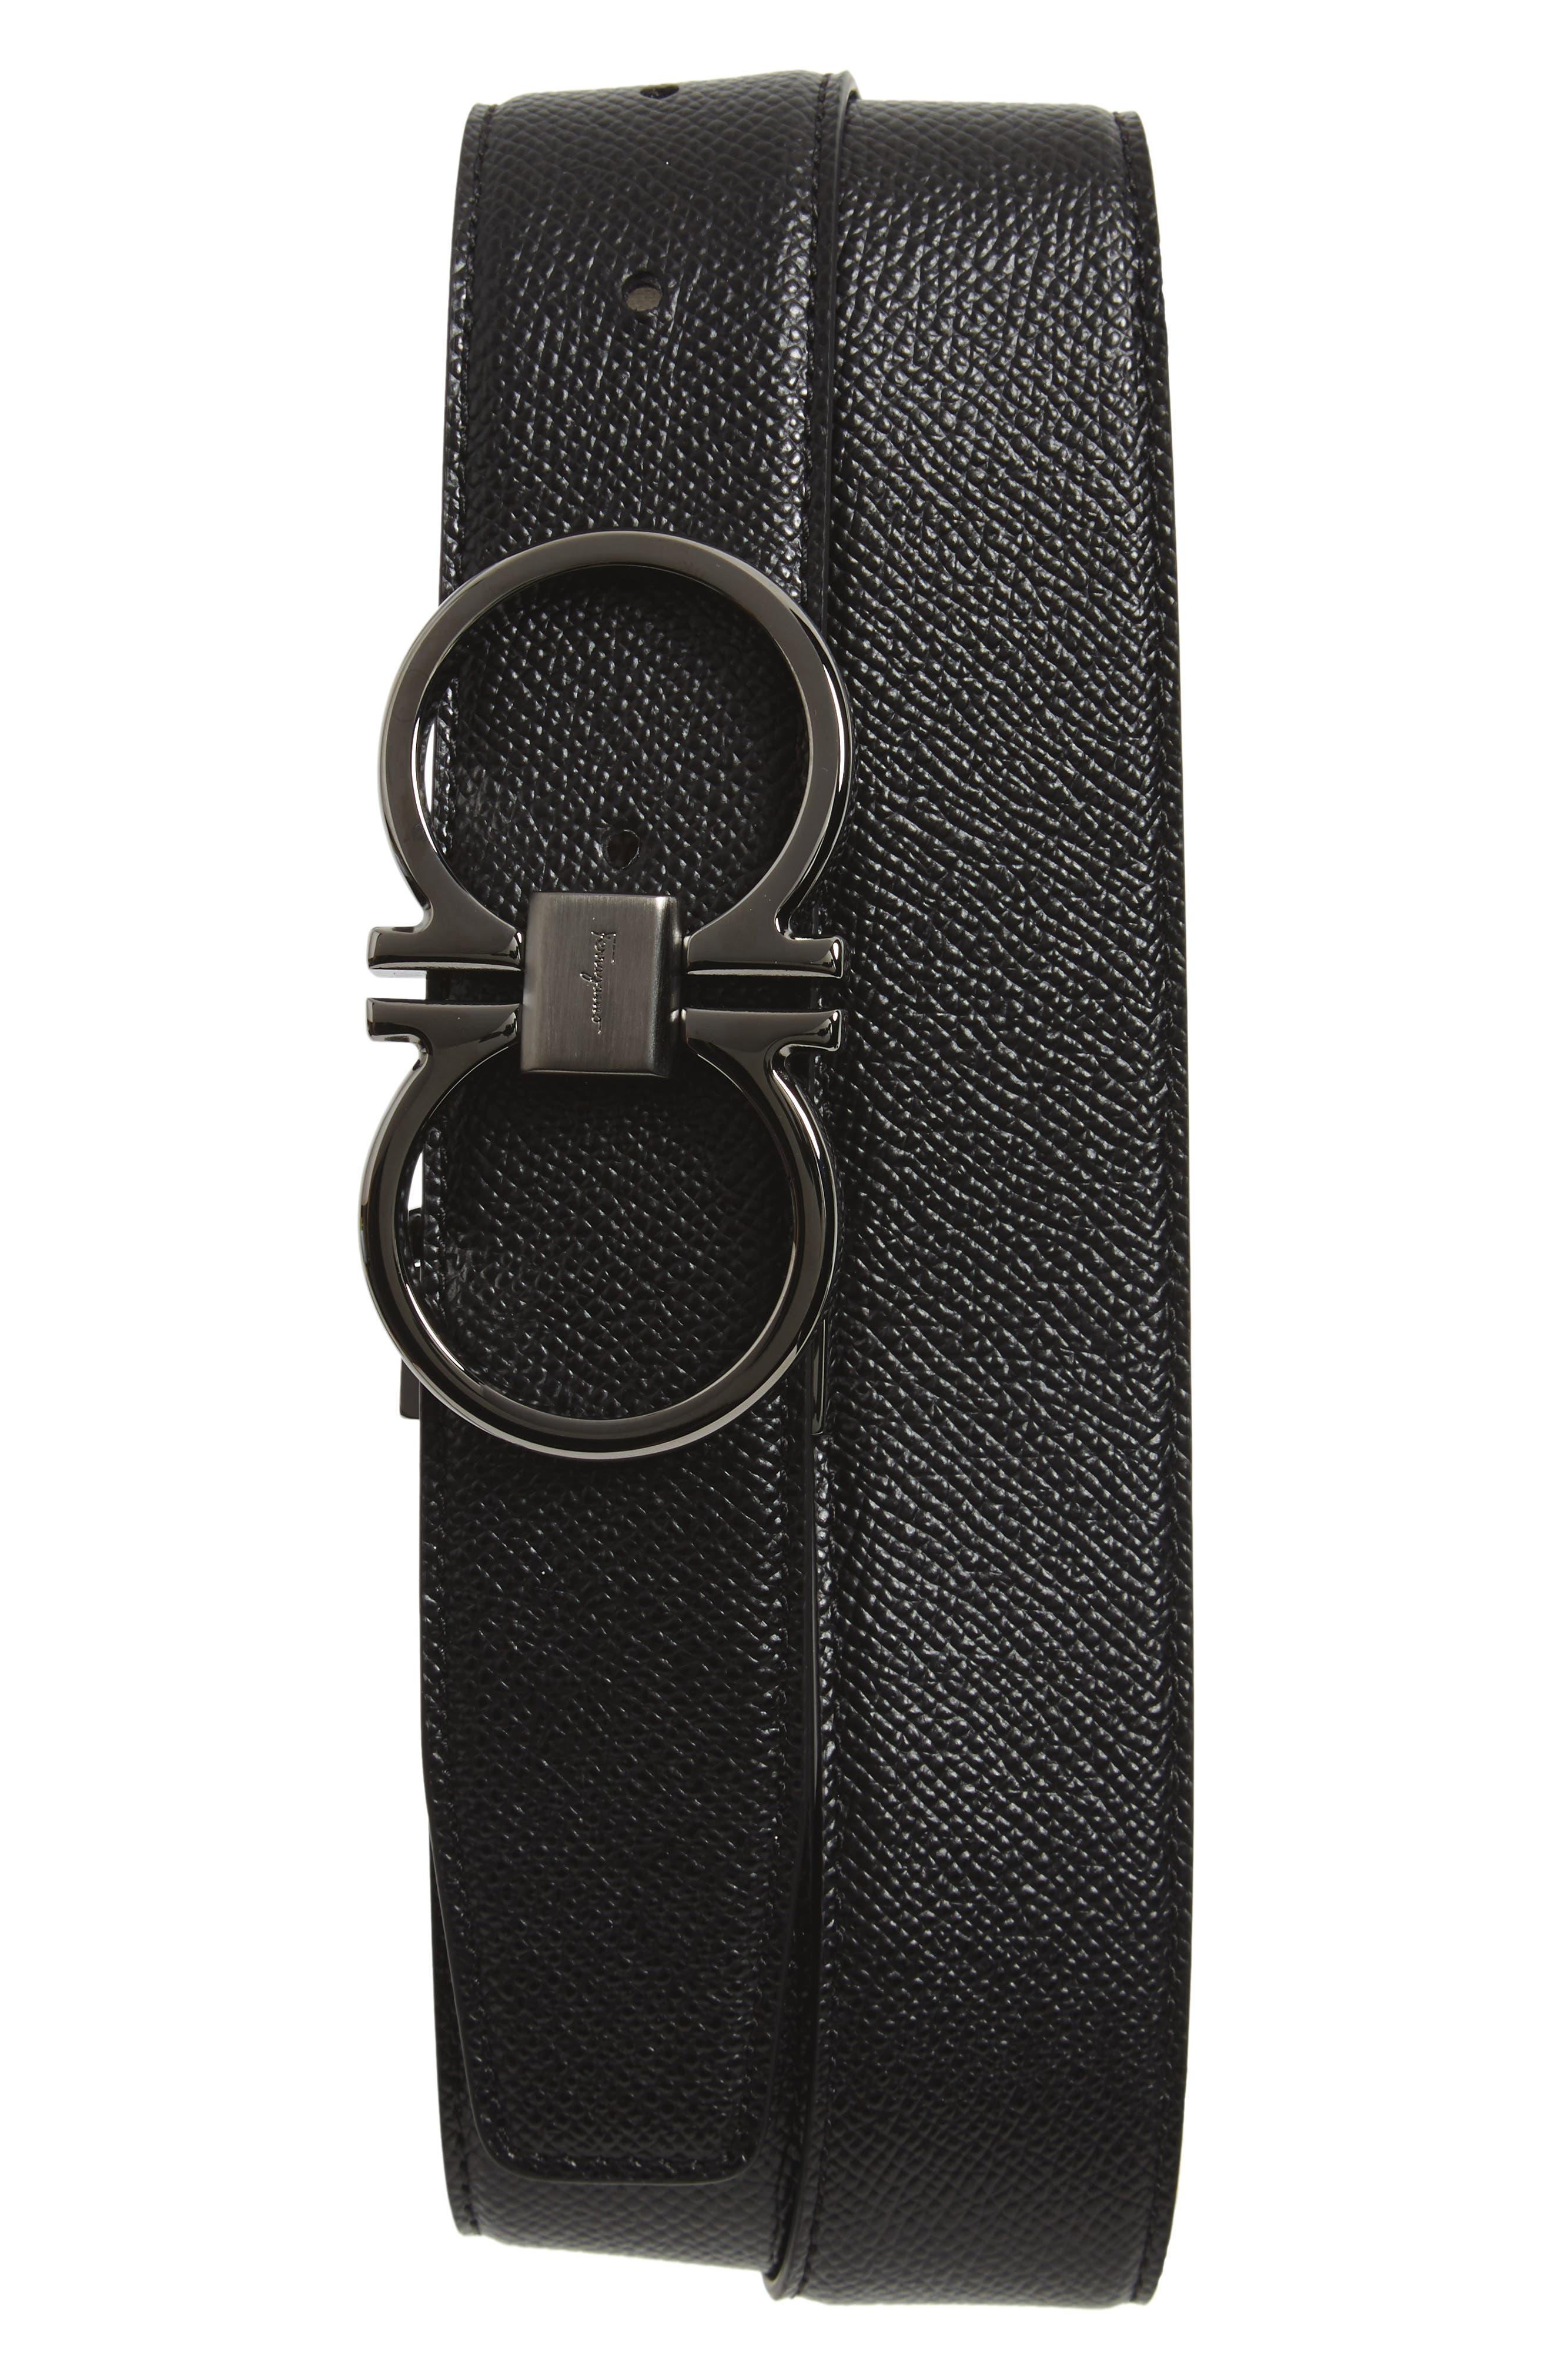 SALVATORE FERRAGAMO, Double Gancio Leather Belt, Main thumbnail 1, color, BLACK/ T MORO